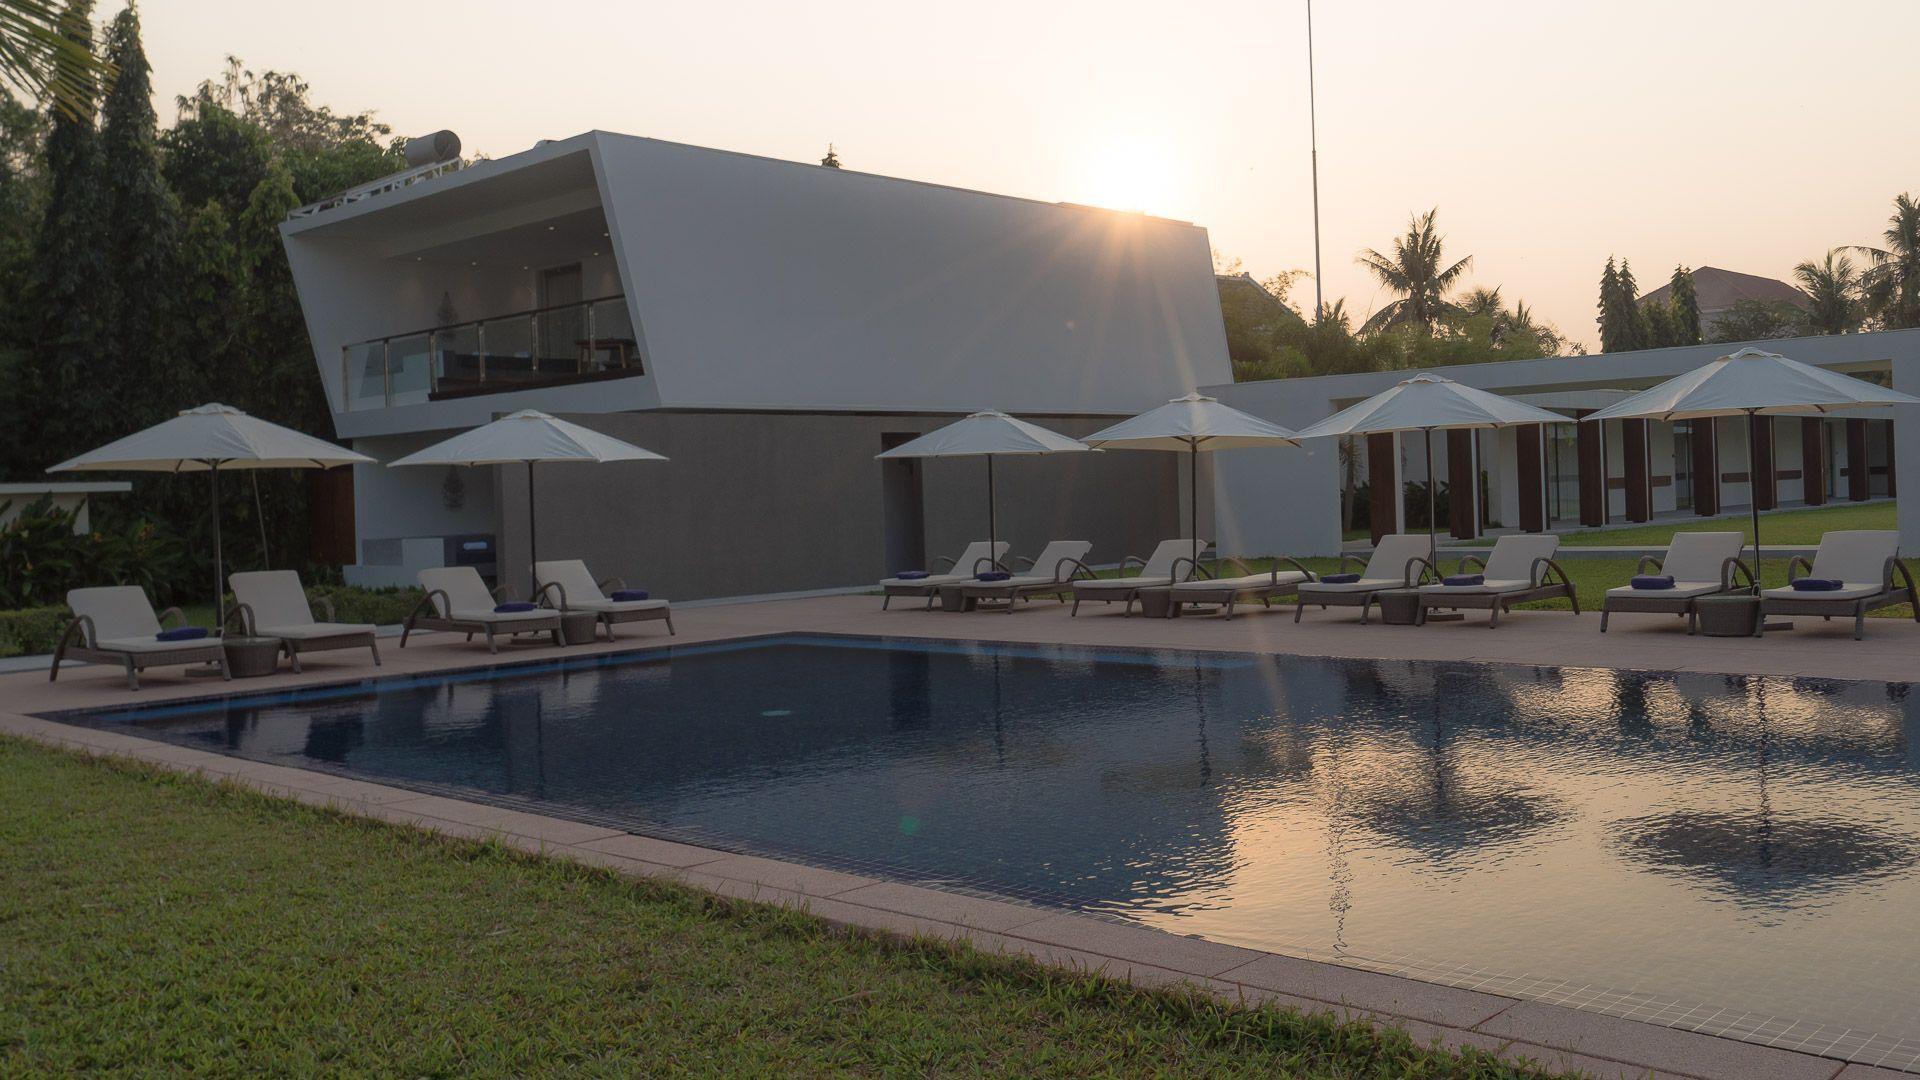 Lesvoyageuses-voyage-Phnom-Penh-cambodge-hotel-the-bale-experience-40